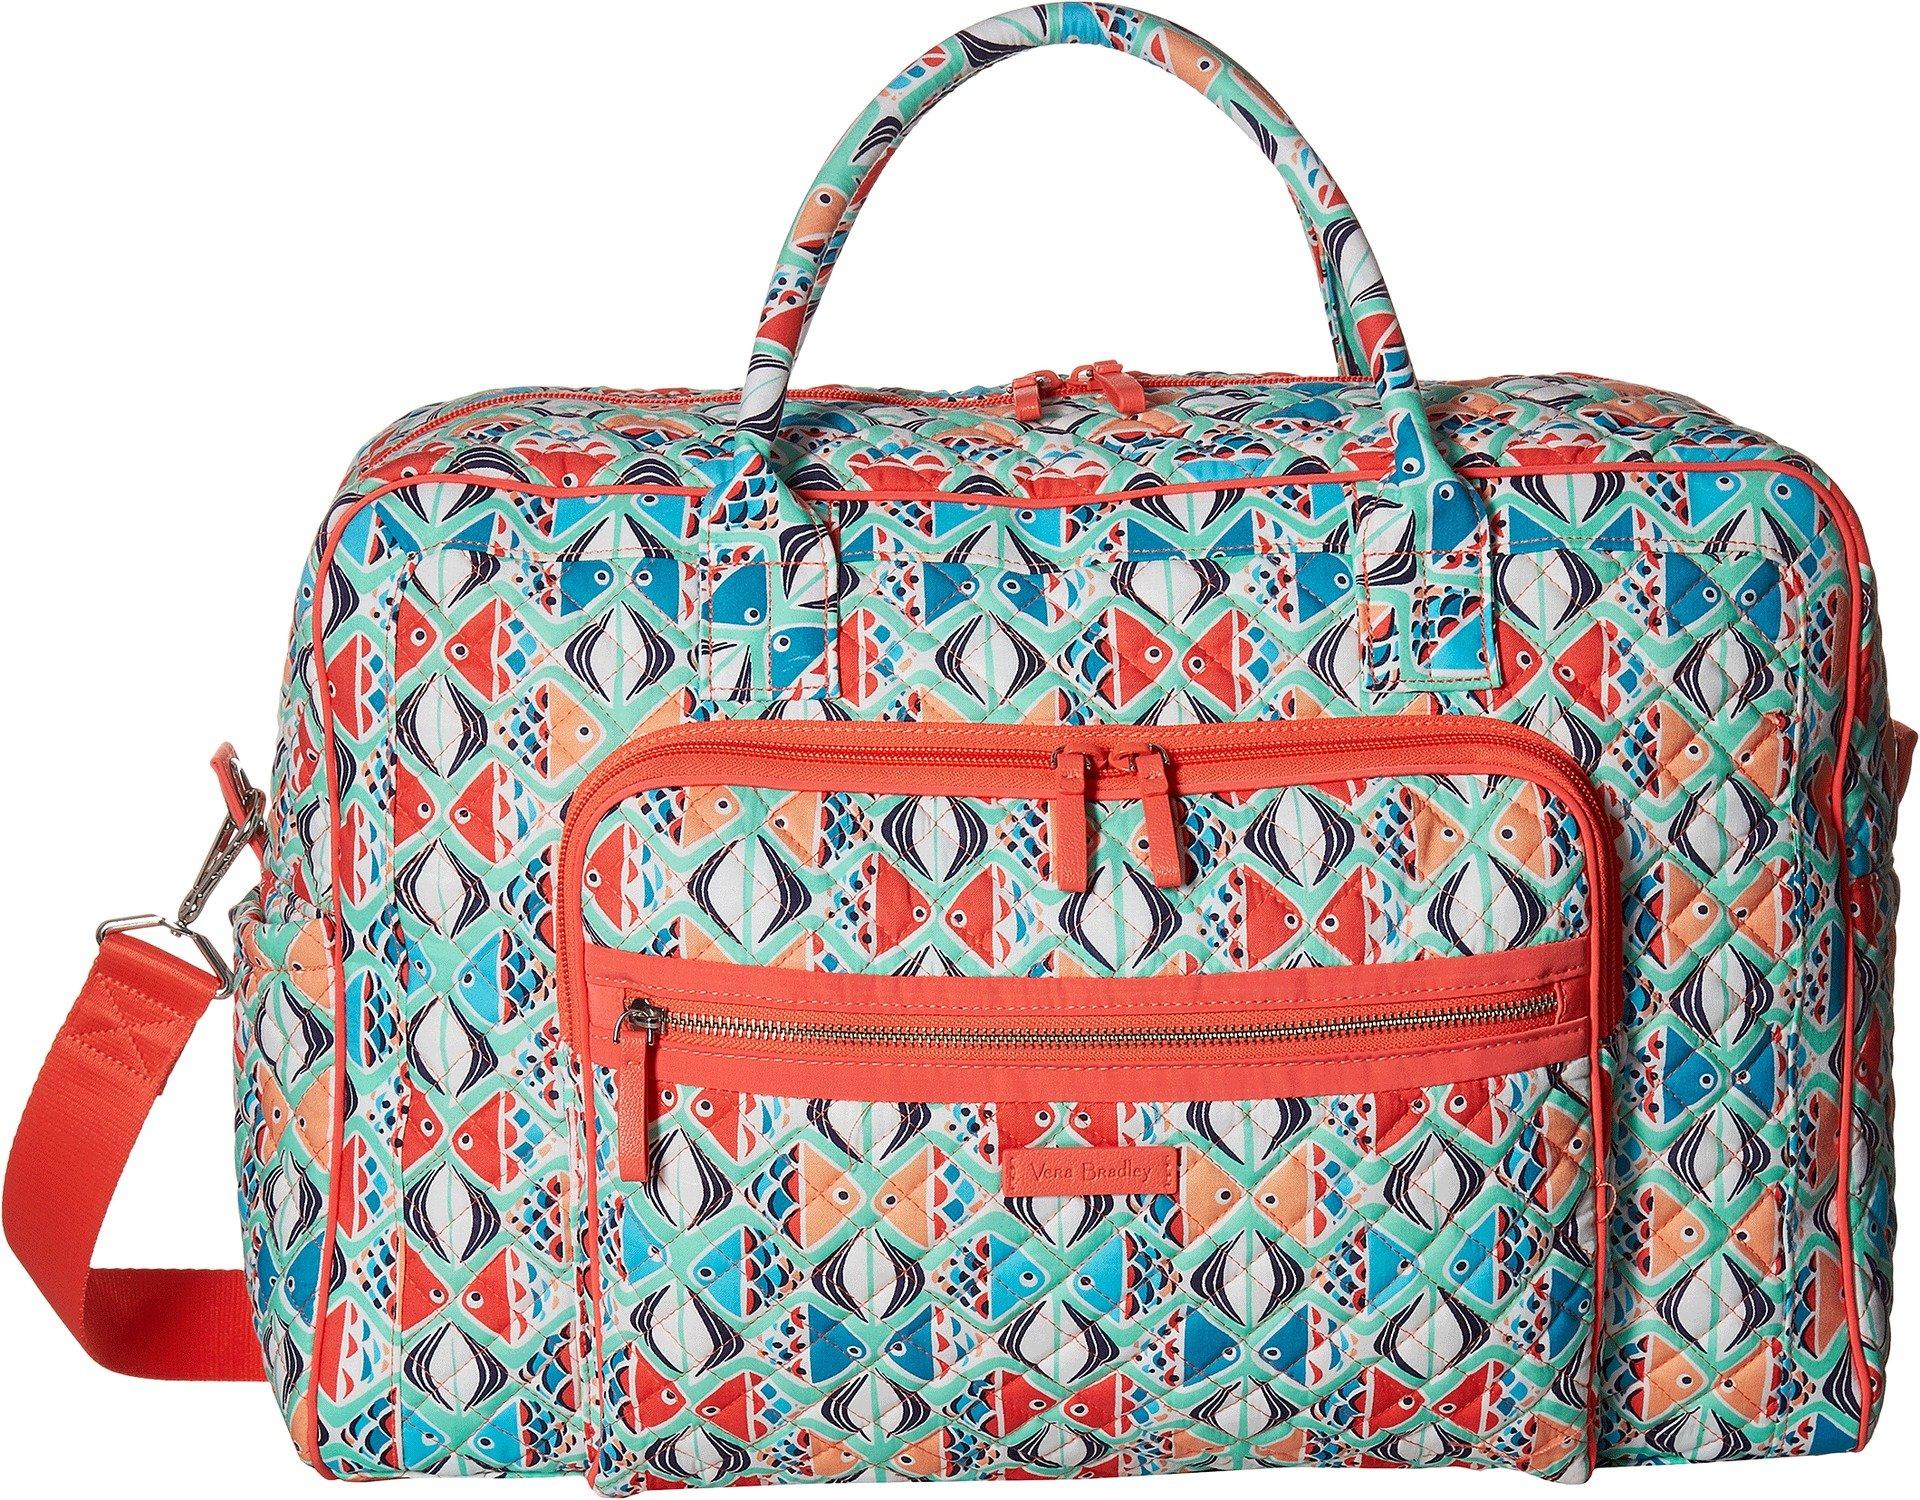 Vera Bradley Iconic Weekender Travel Bag, Signature Cotton, Go Fish, One Size